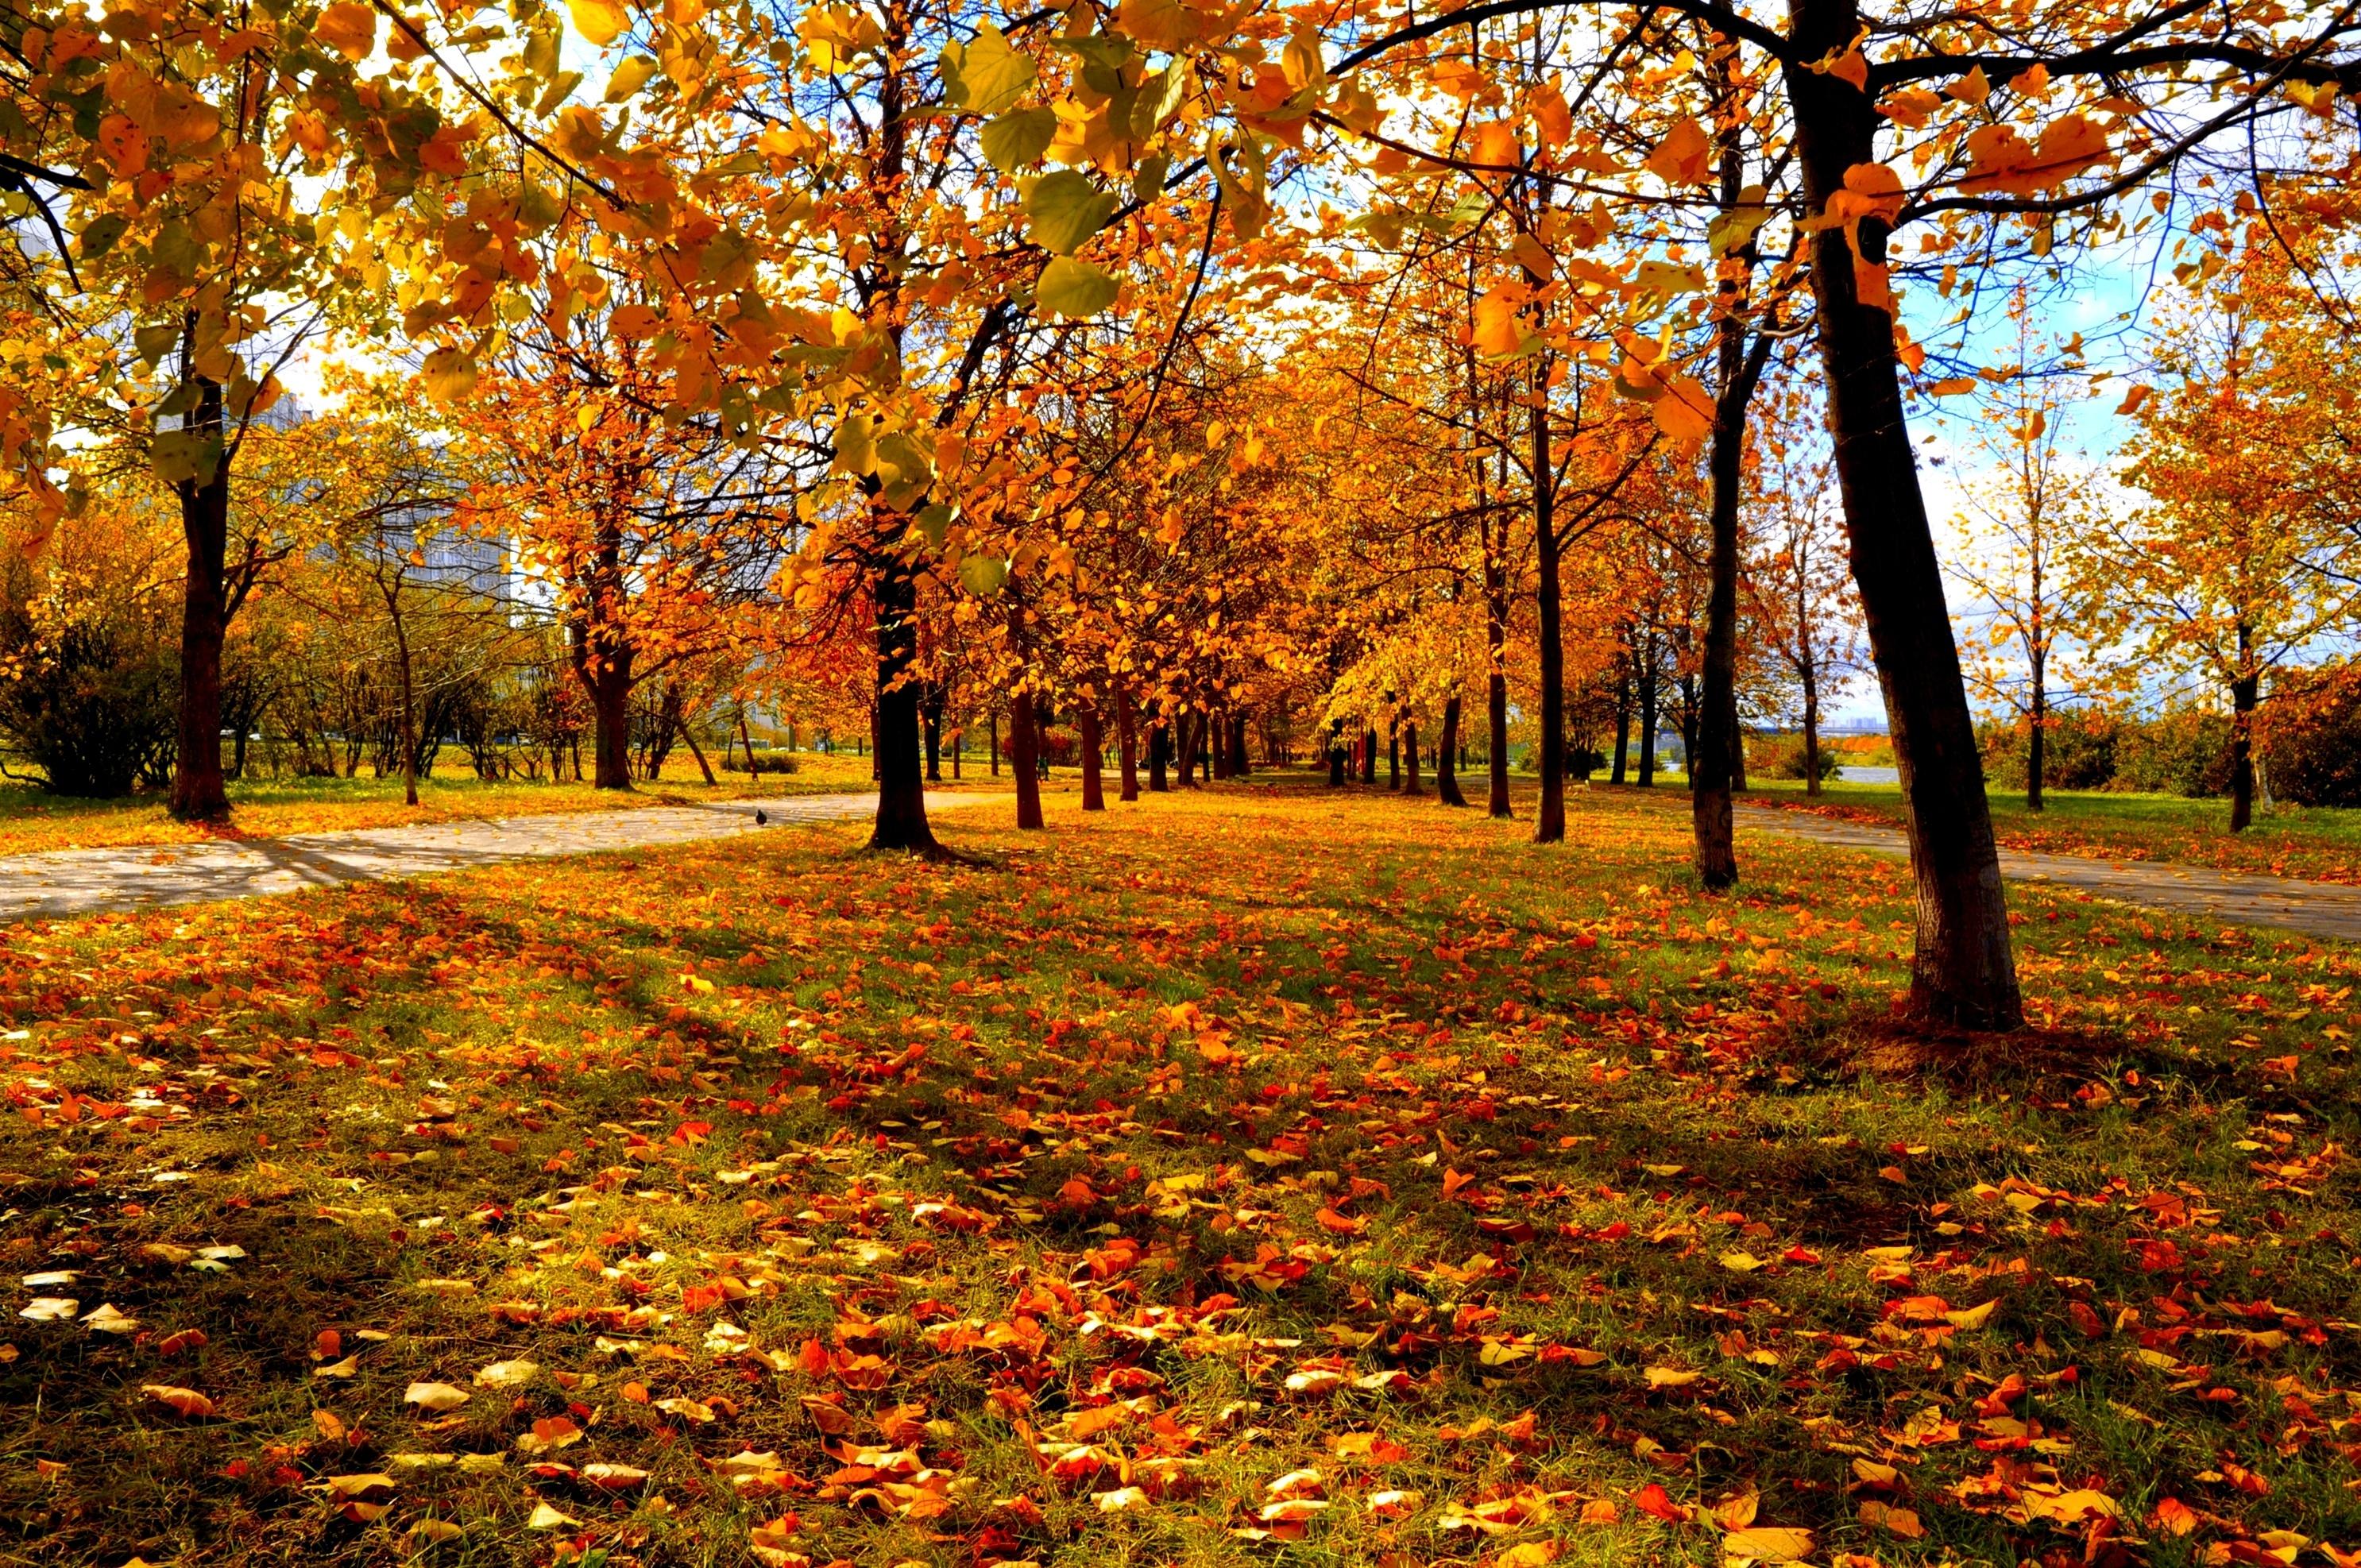 trees autumn city park wallpaper background 2972x1974